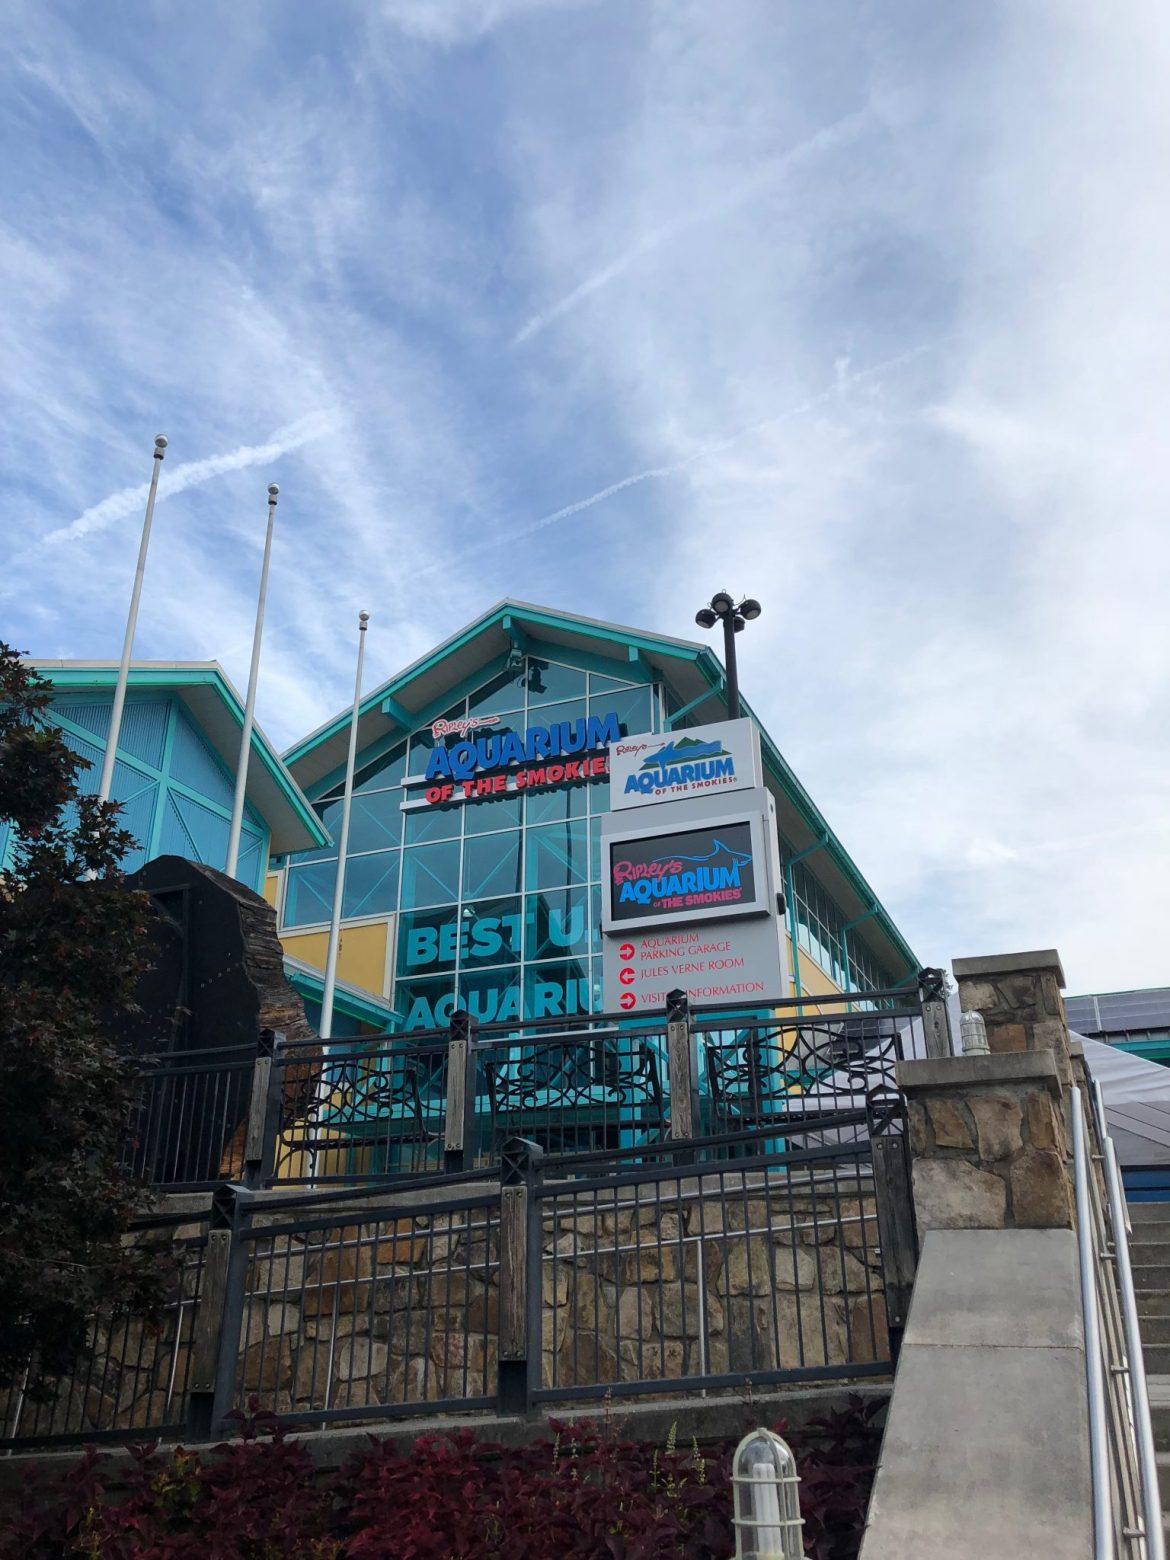 Ripley's Aquarium of the Smokies ad